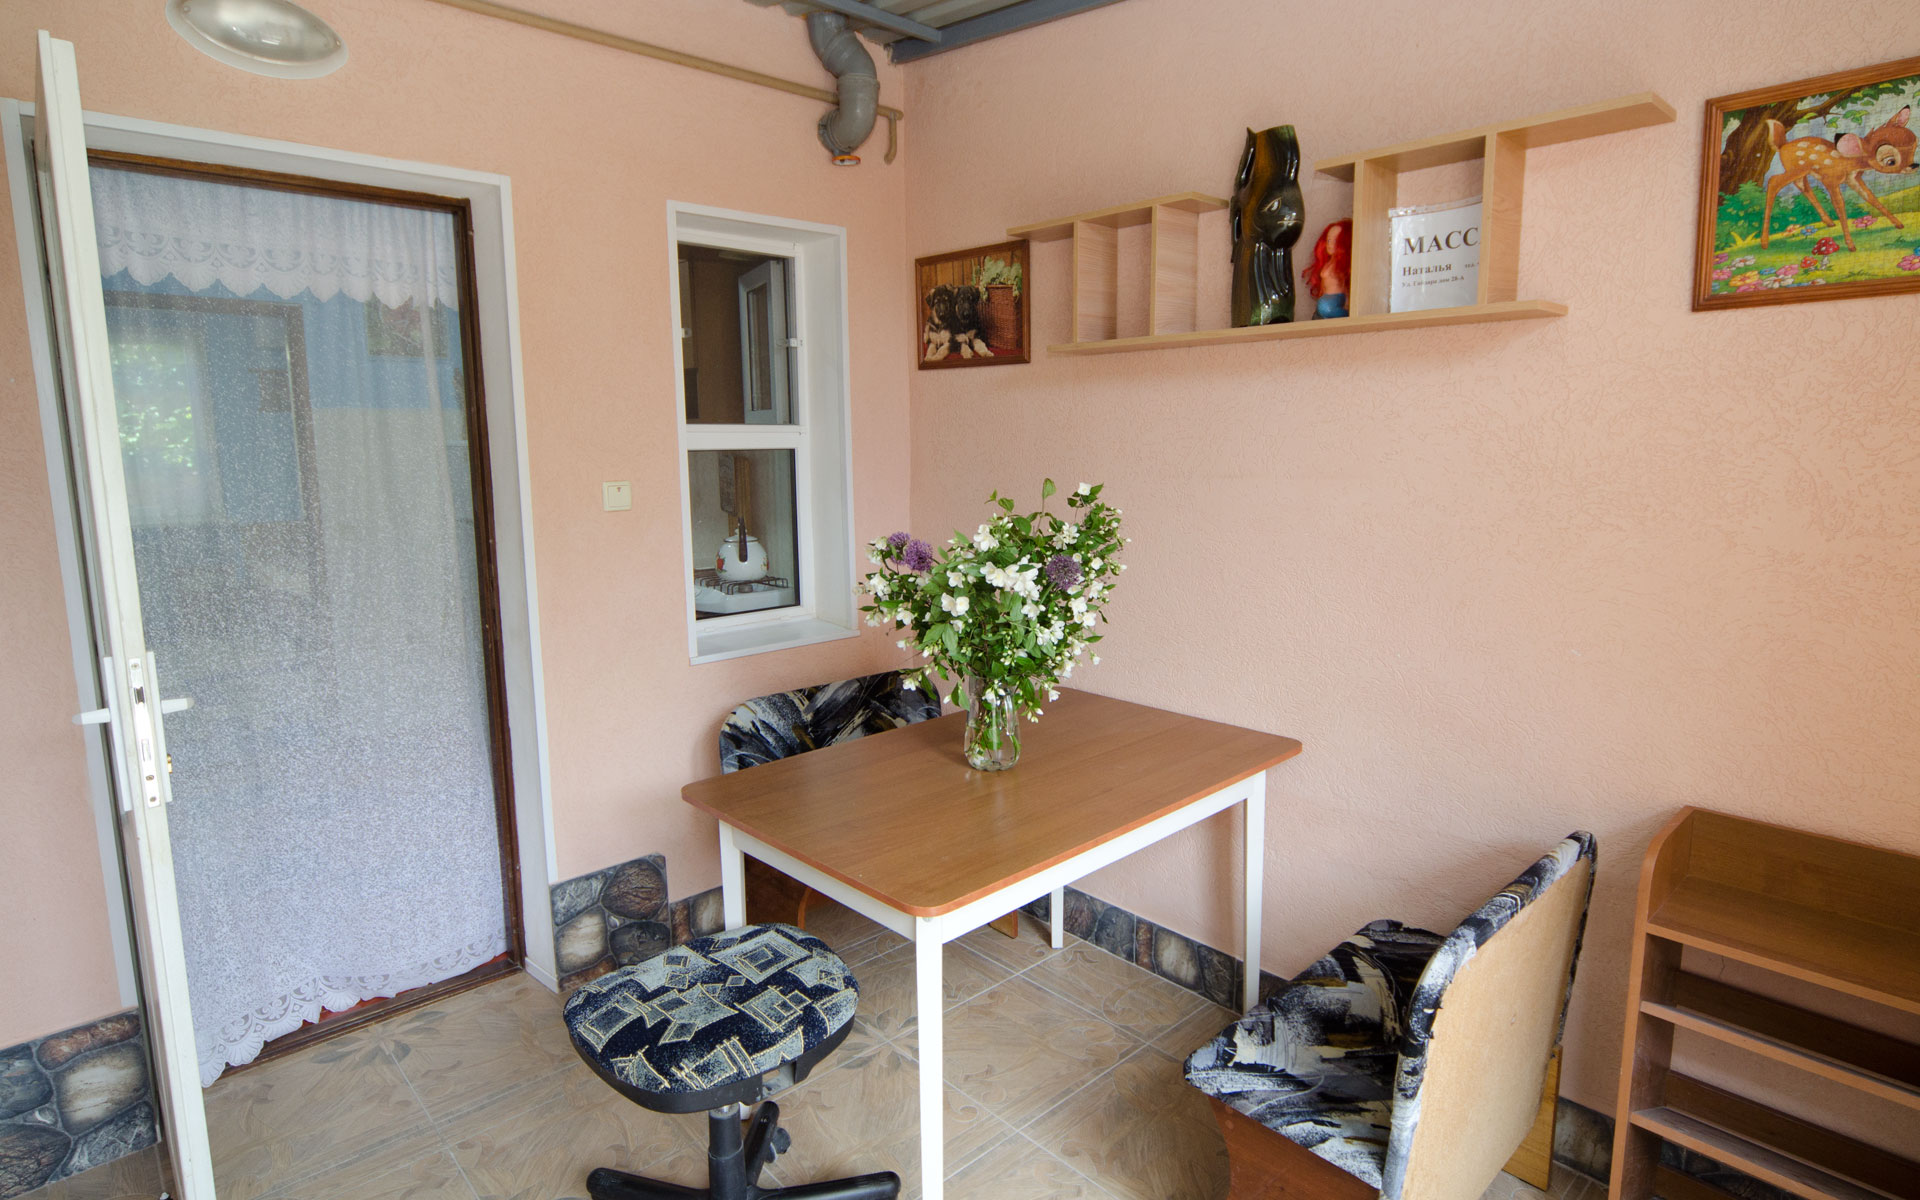 Беседка 2 номера. Квартира 2. 2 квартиры на ул. Гайдара. Заозёрное